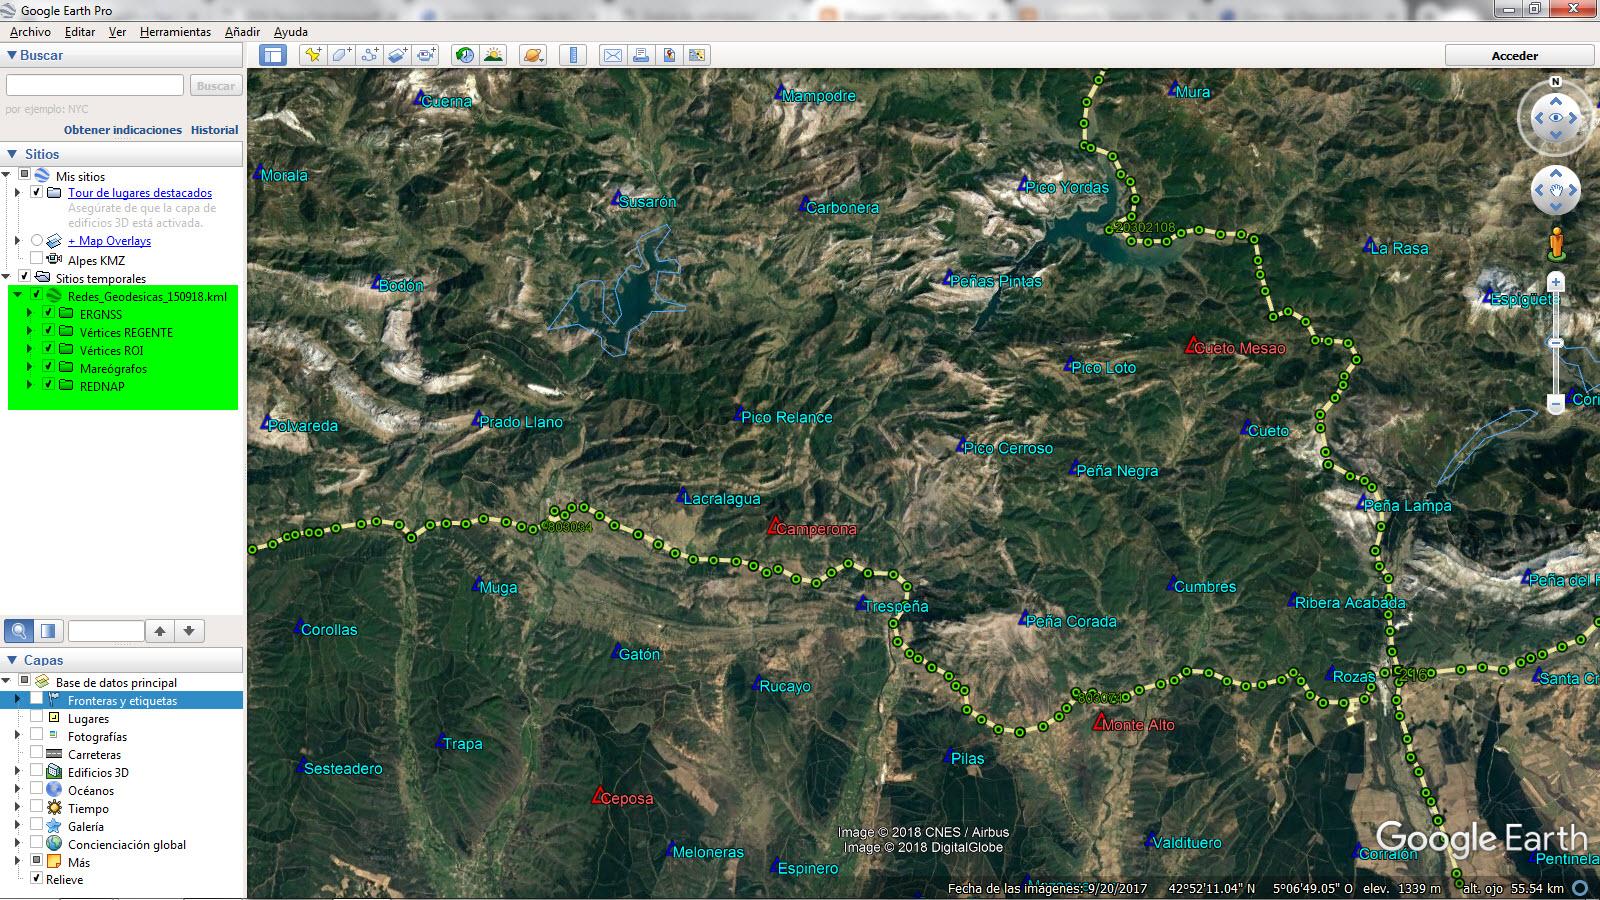 archivo redes geodesicas 150918 kmz abierto en gogle earth